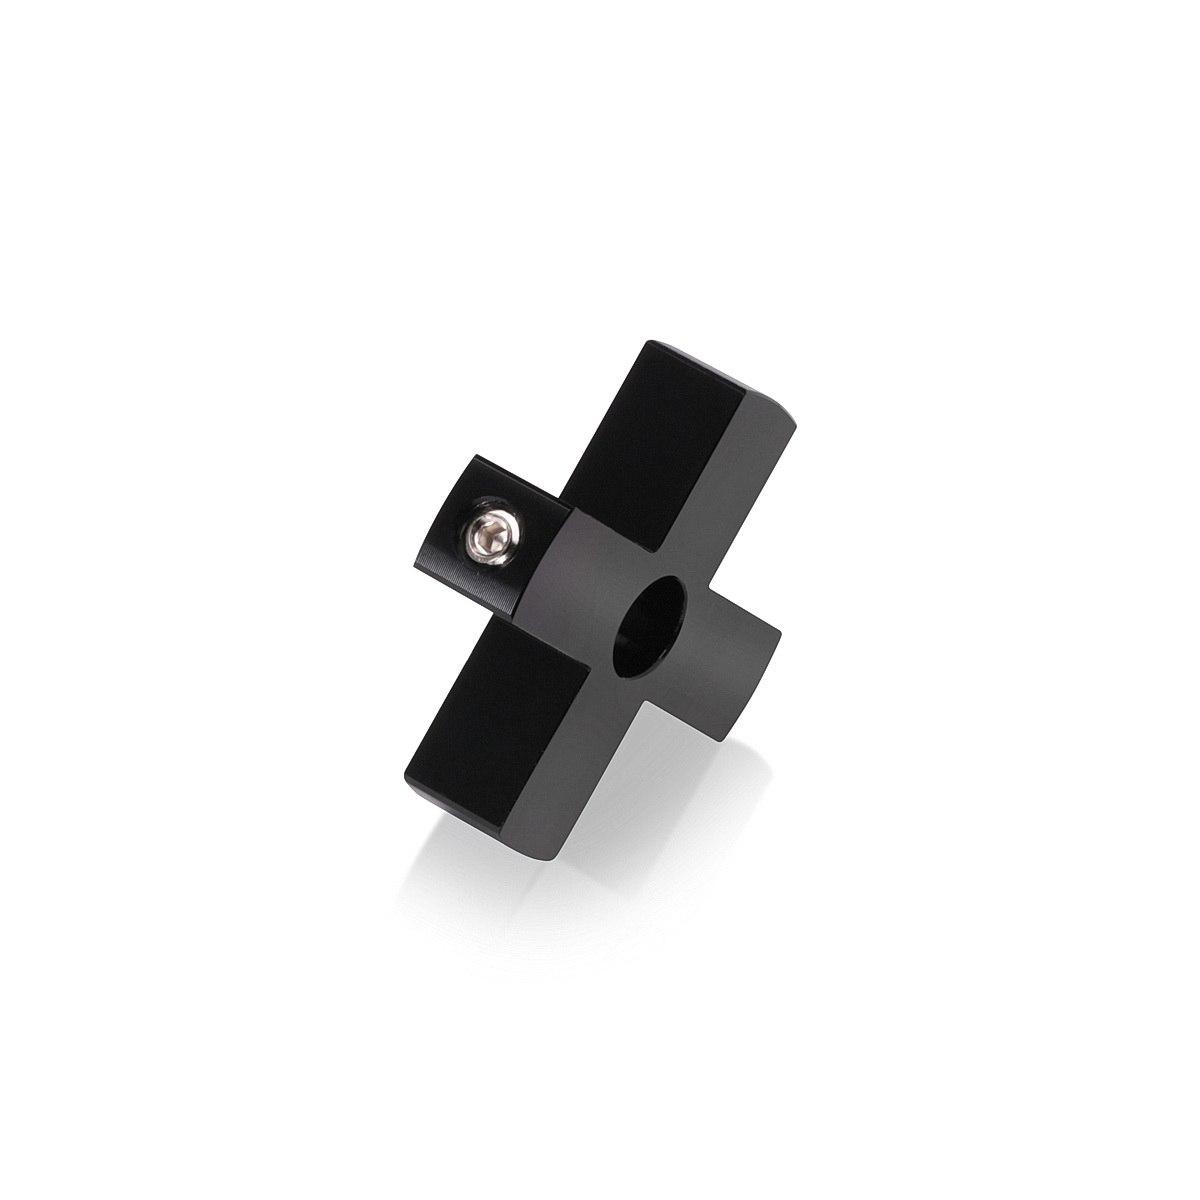 4-Way Standoffs Hub, Diameter: 1 1/2'', Thickness: 3/8'', Black Anodized Aluminum